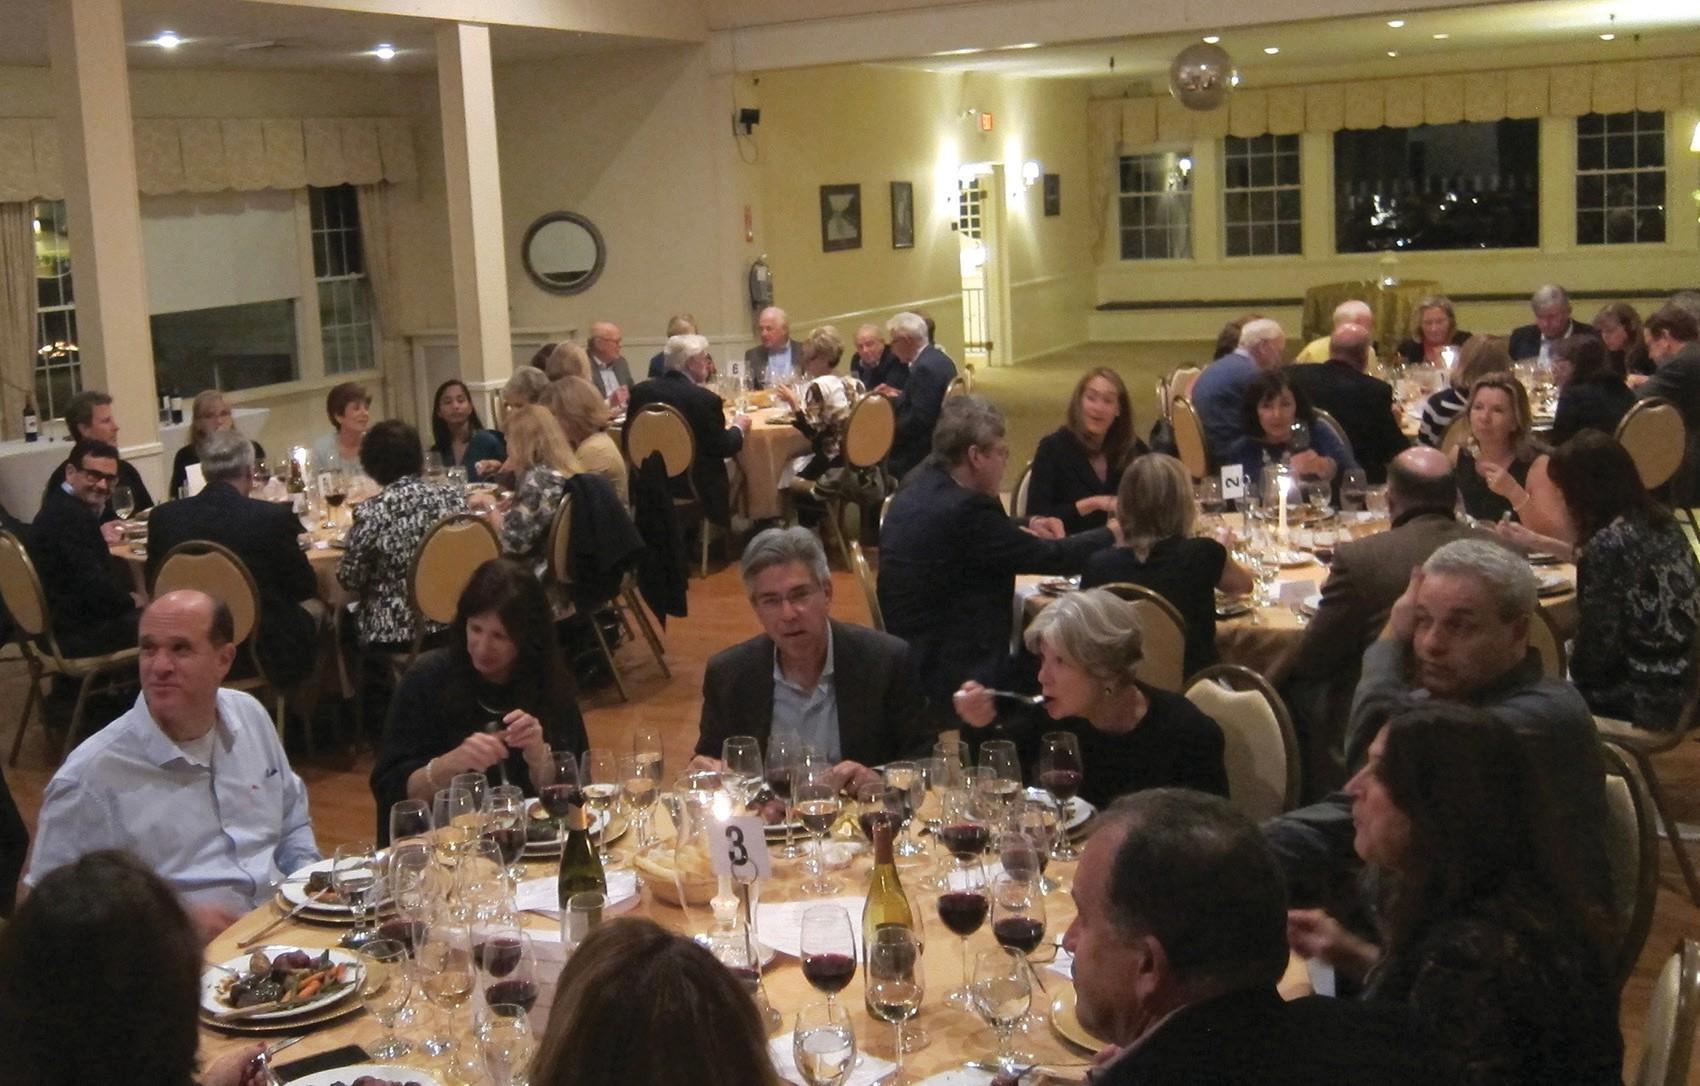 Garden City Casino hosts Wine Tasting Event | Garden City News